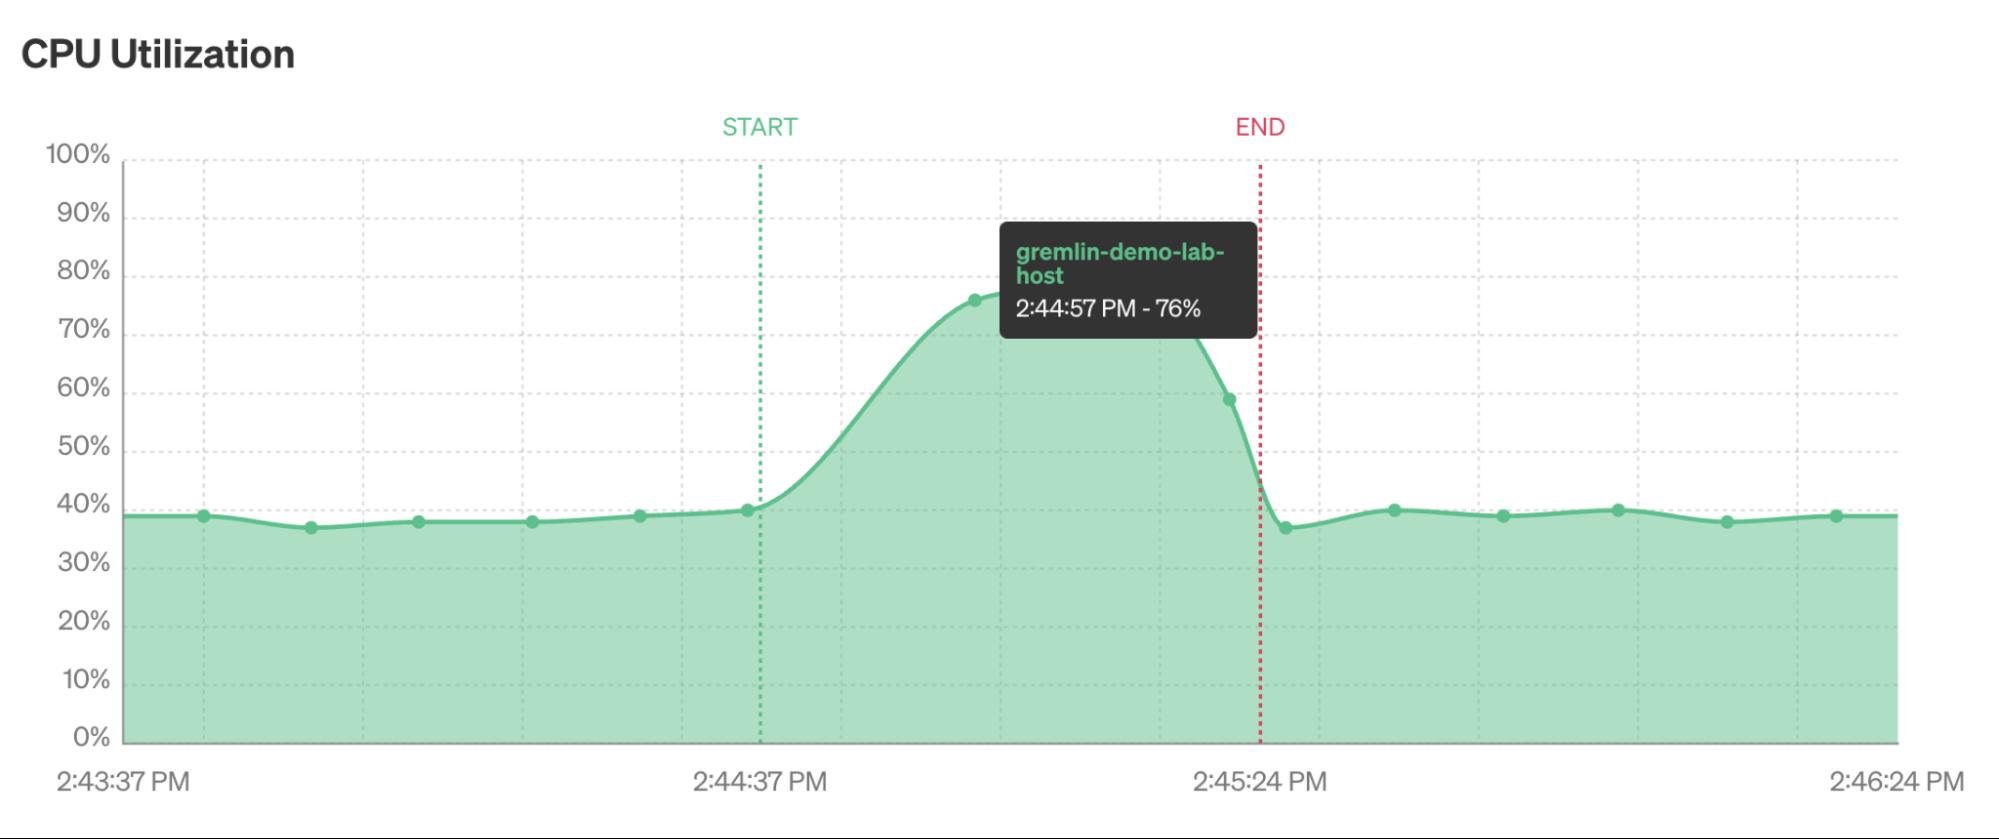 Gremlin chart showing CPU metrics during an attack